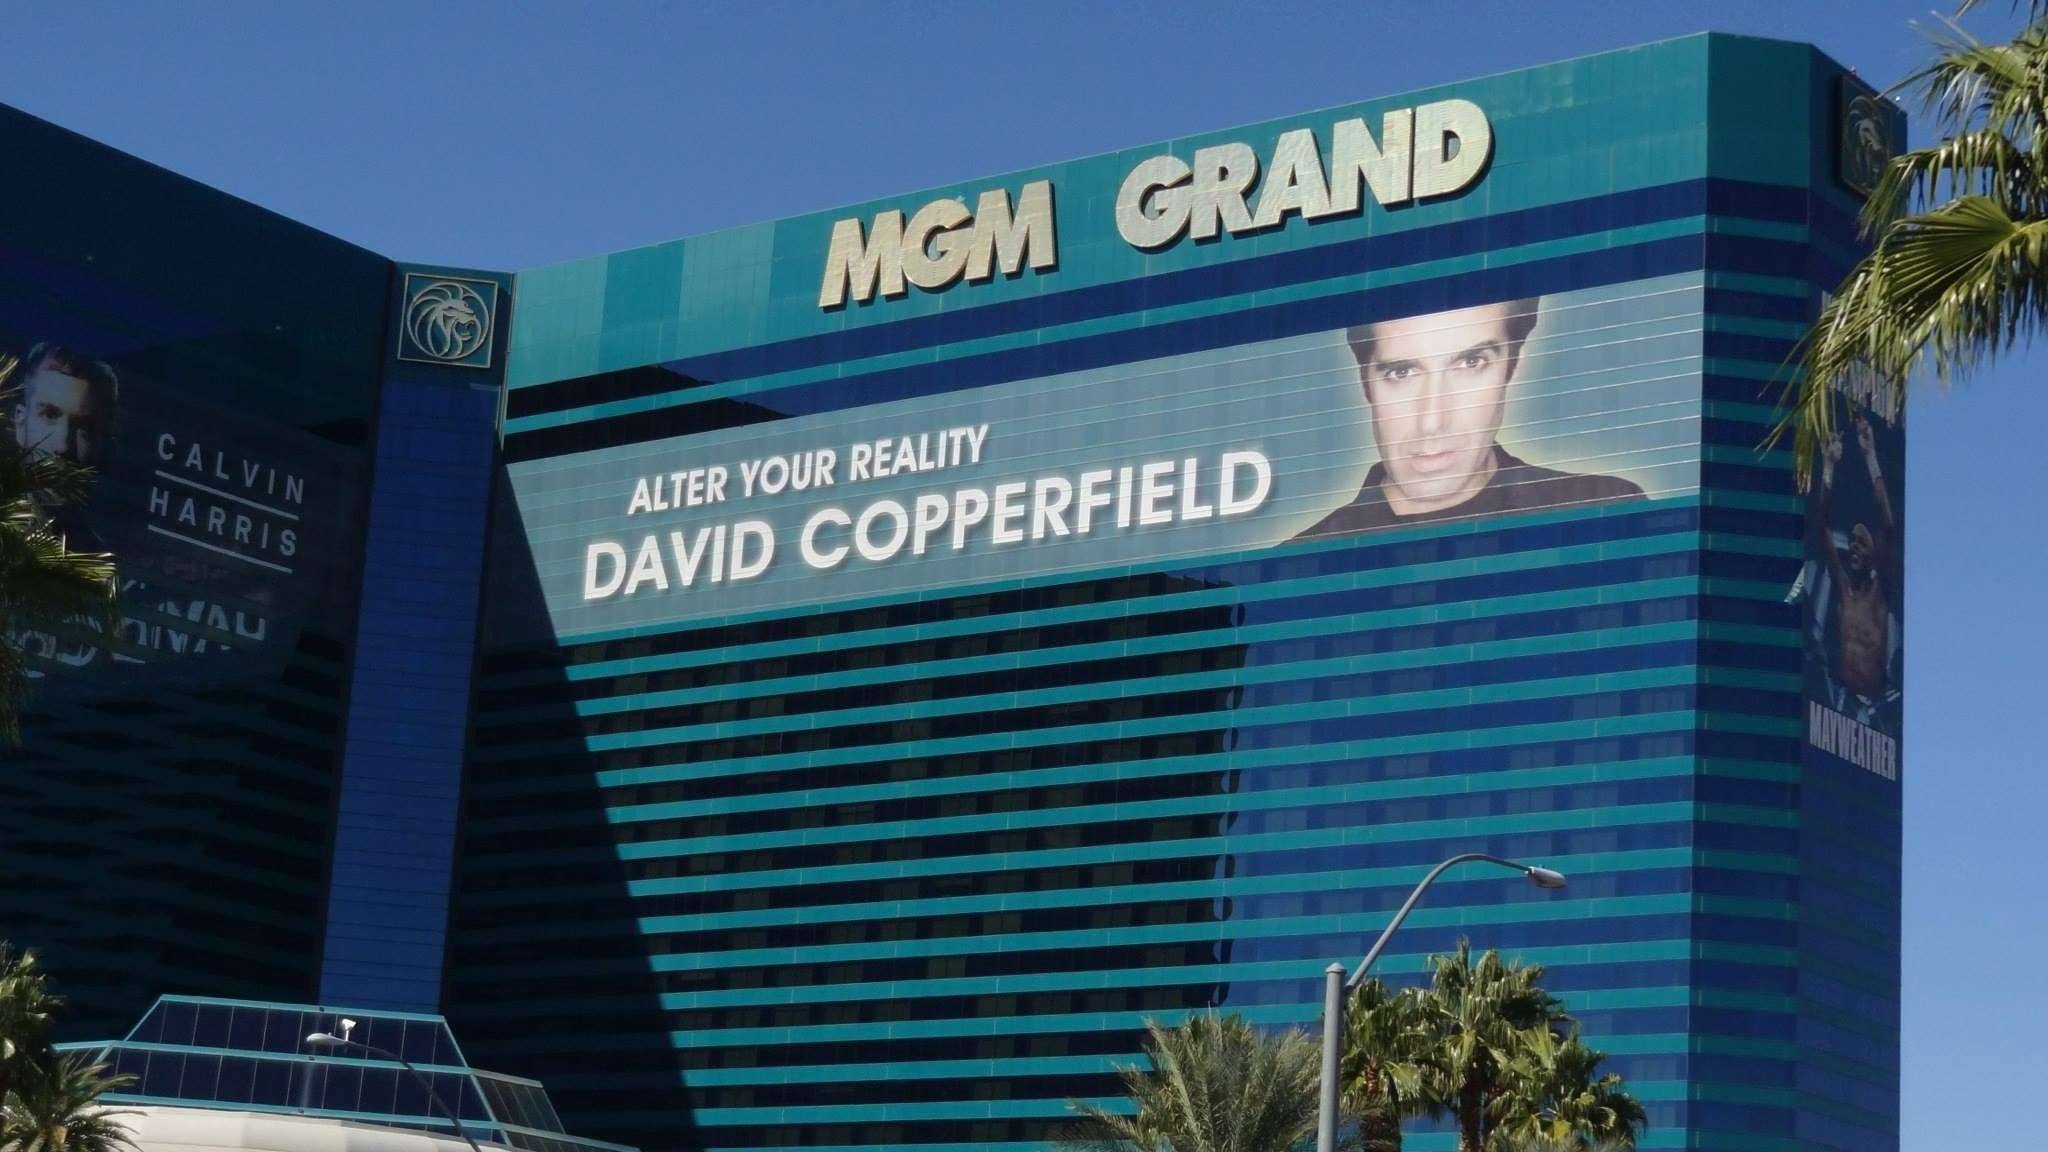 David Copperfield au MGM Grand